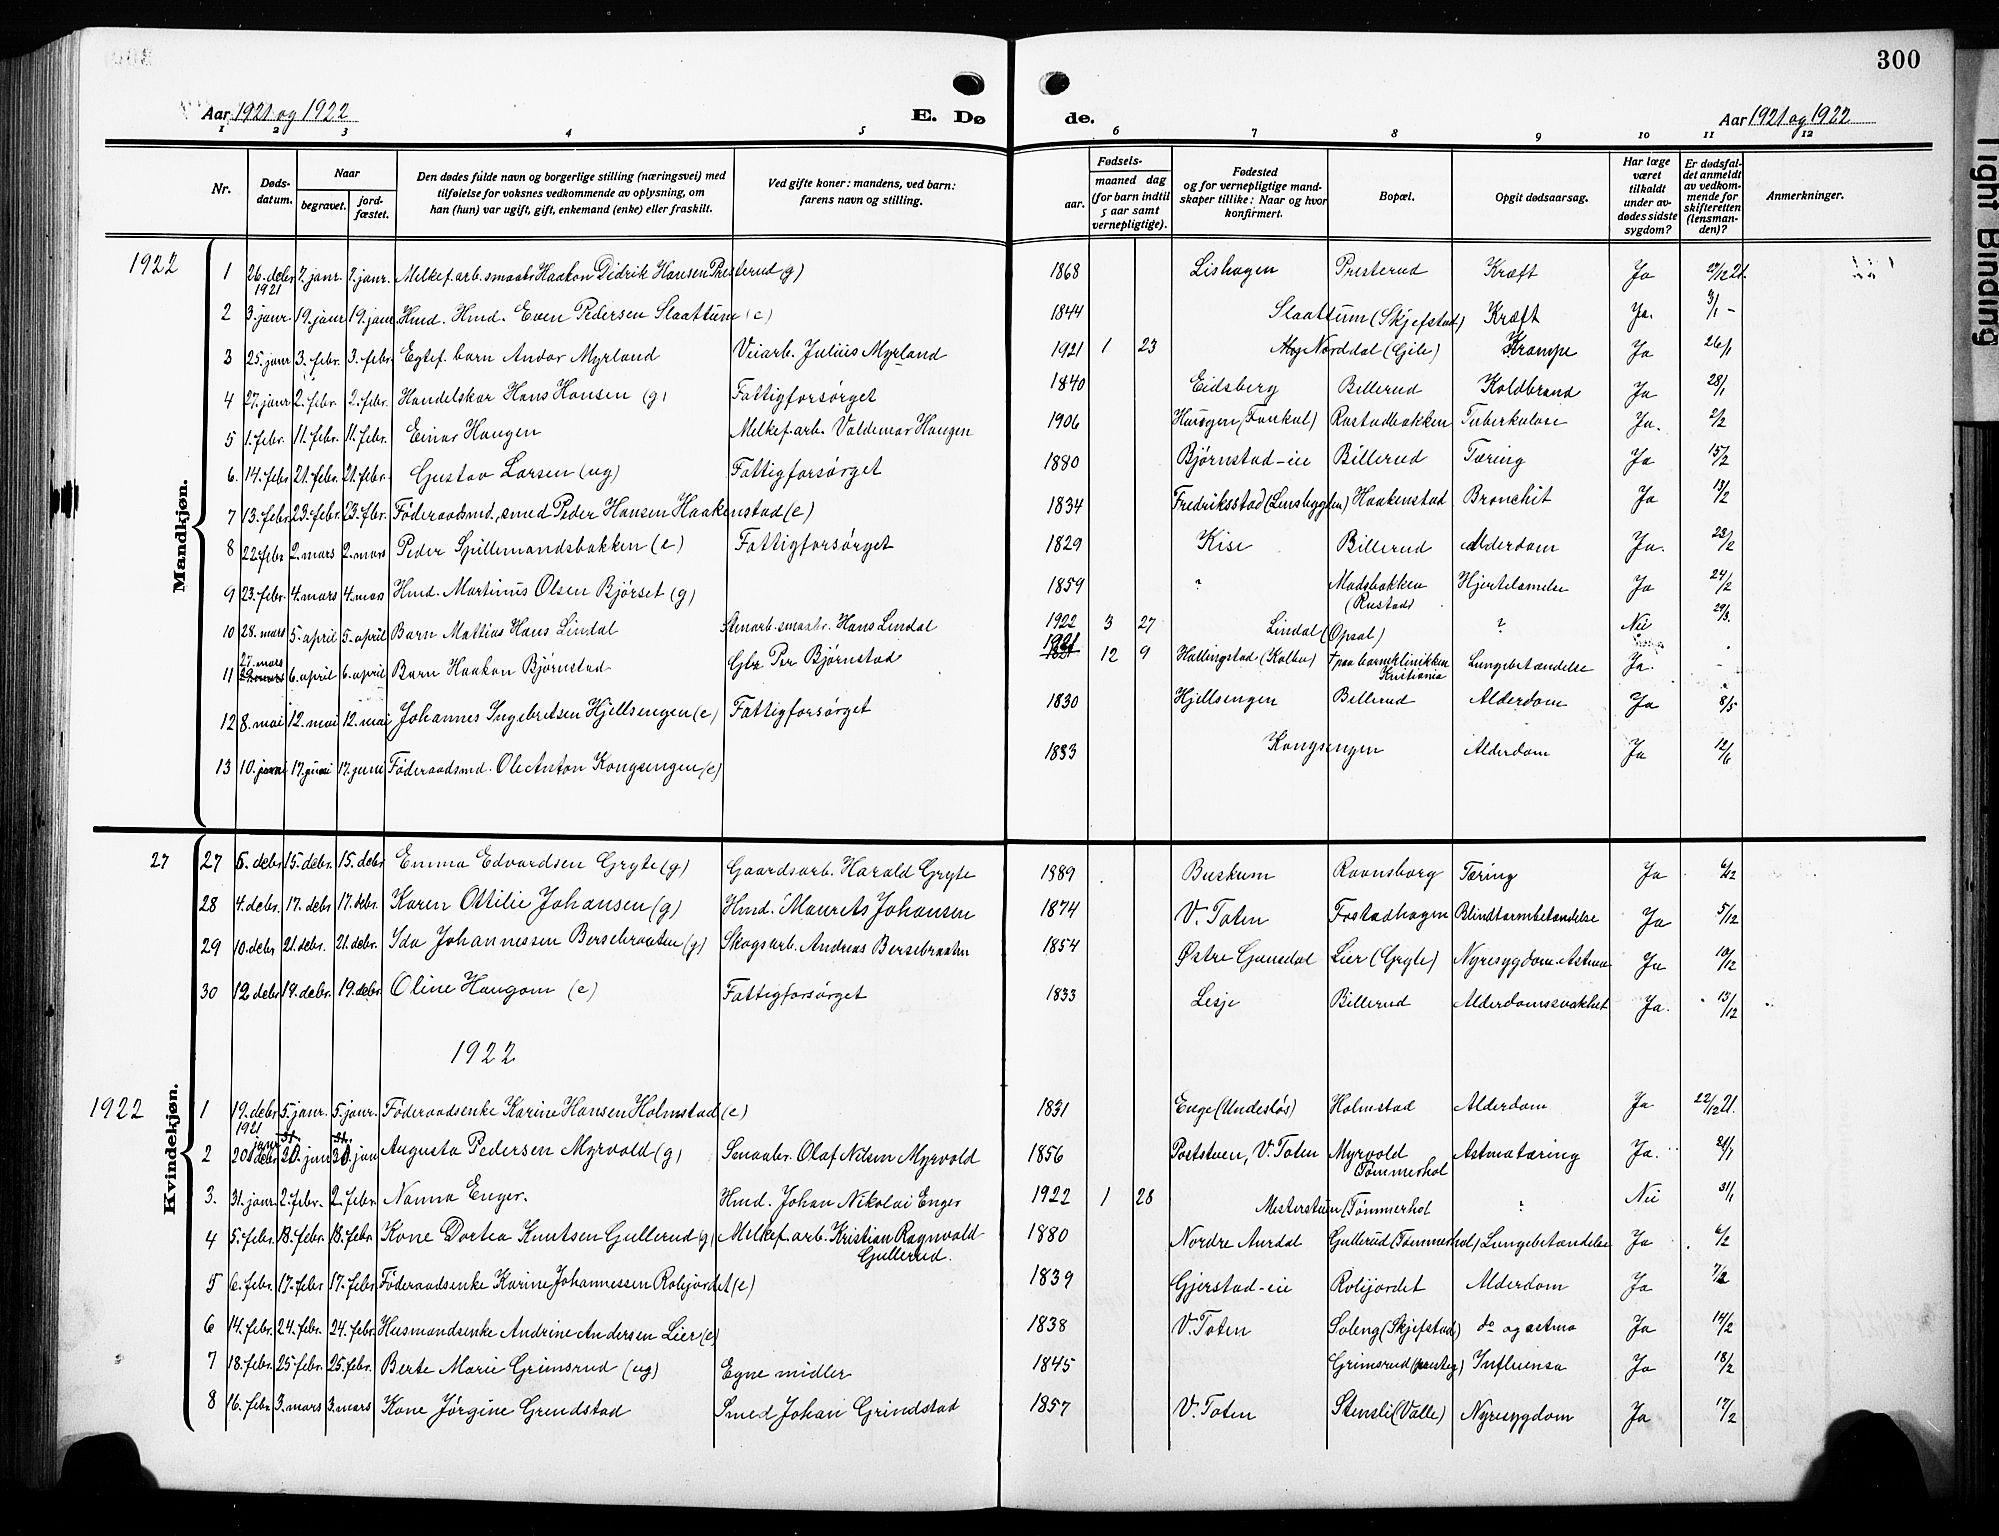 SAH, Østre Toten prestekontor, Klokkerbok nr. 10, 1912-1933, s. 300